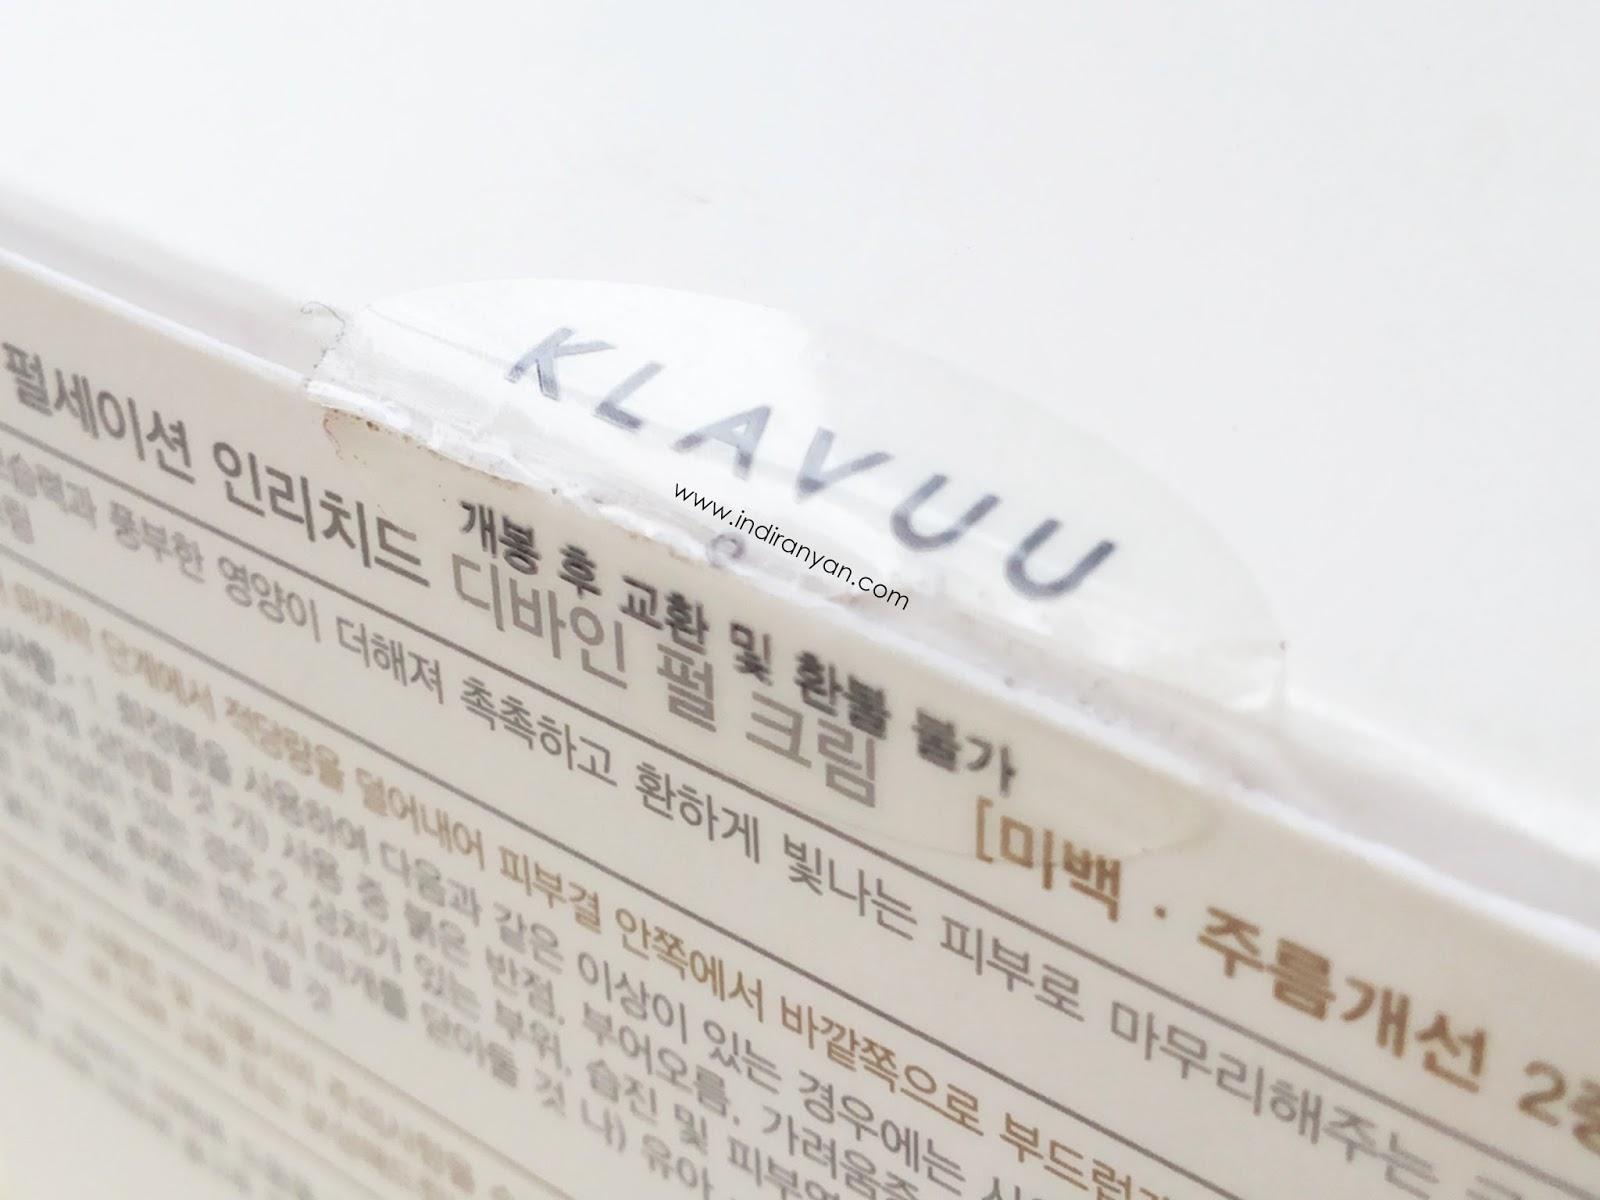 klavuu-white-pearlsation-enriched-divine-pearl-cream